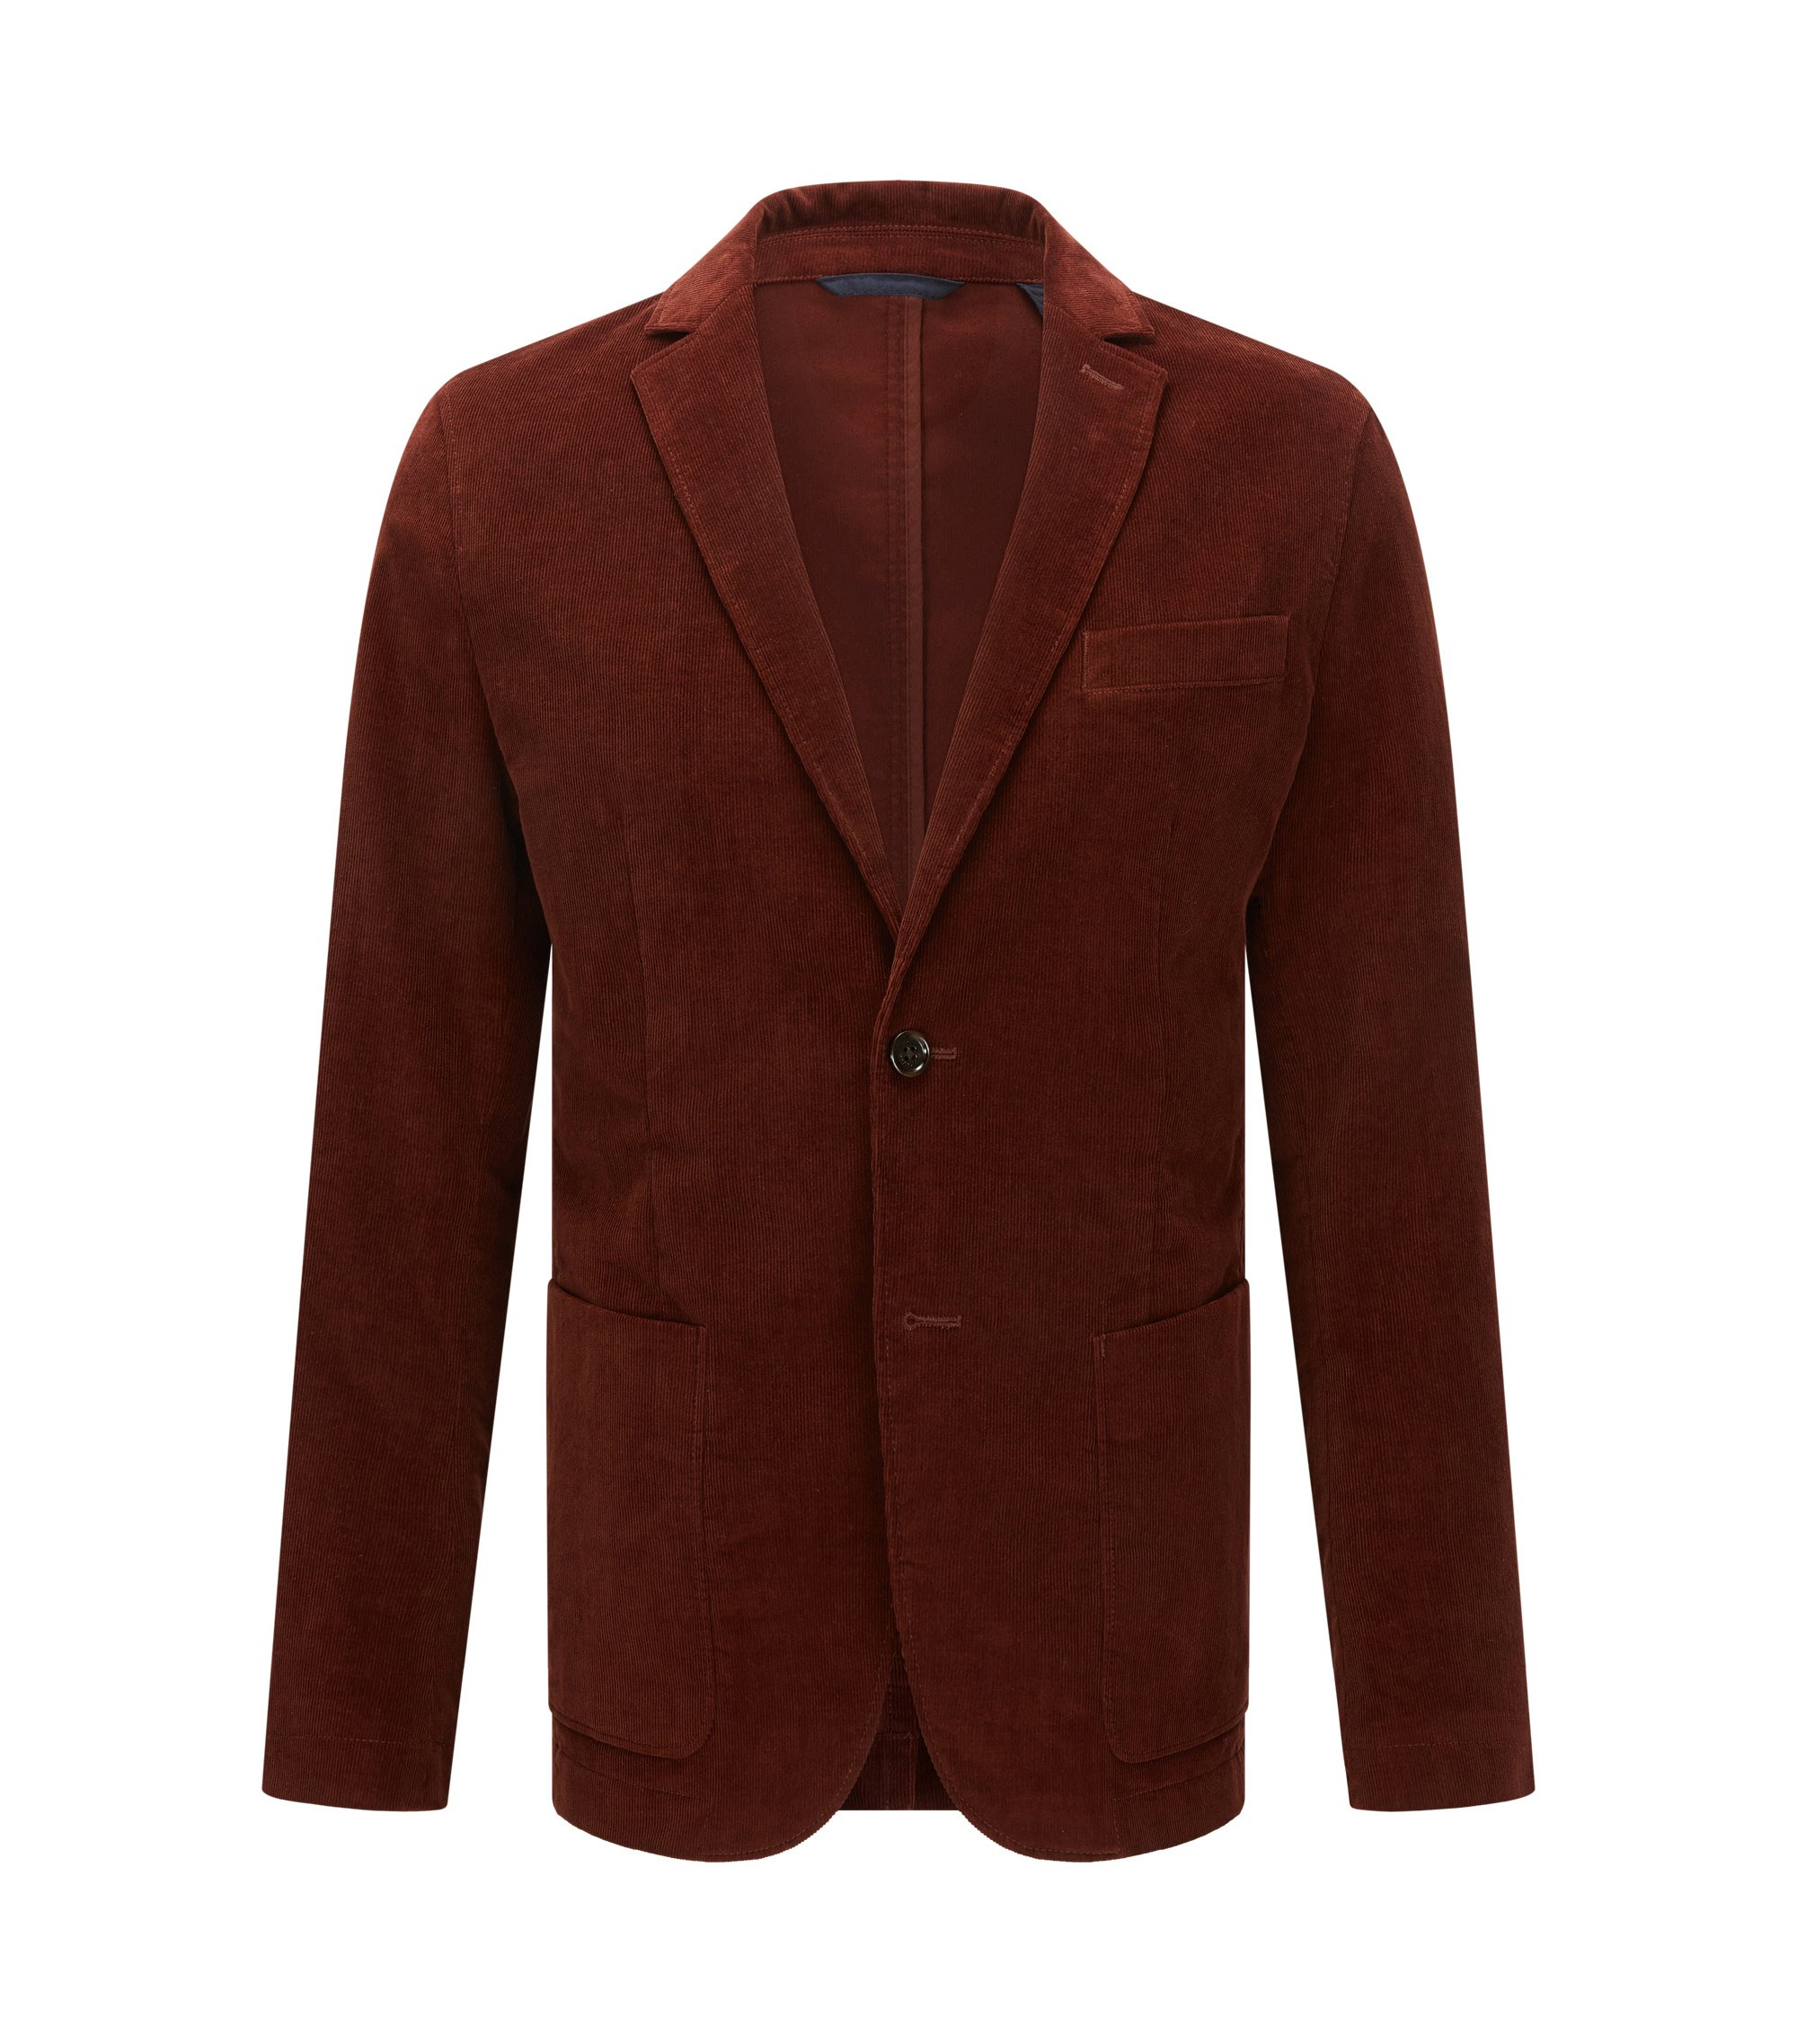 Stretch Corduroy Sport Coat, Slim Fit   Nortens W, Brown